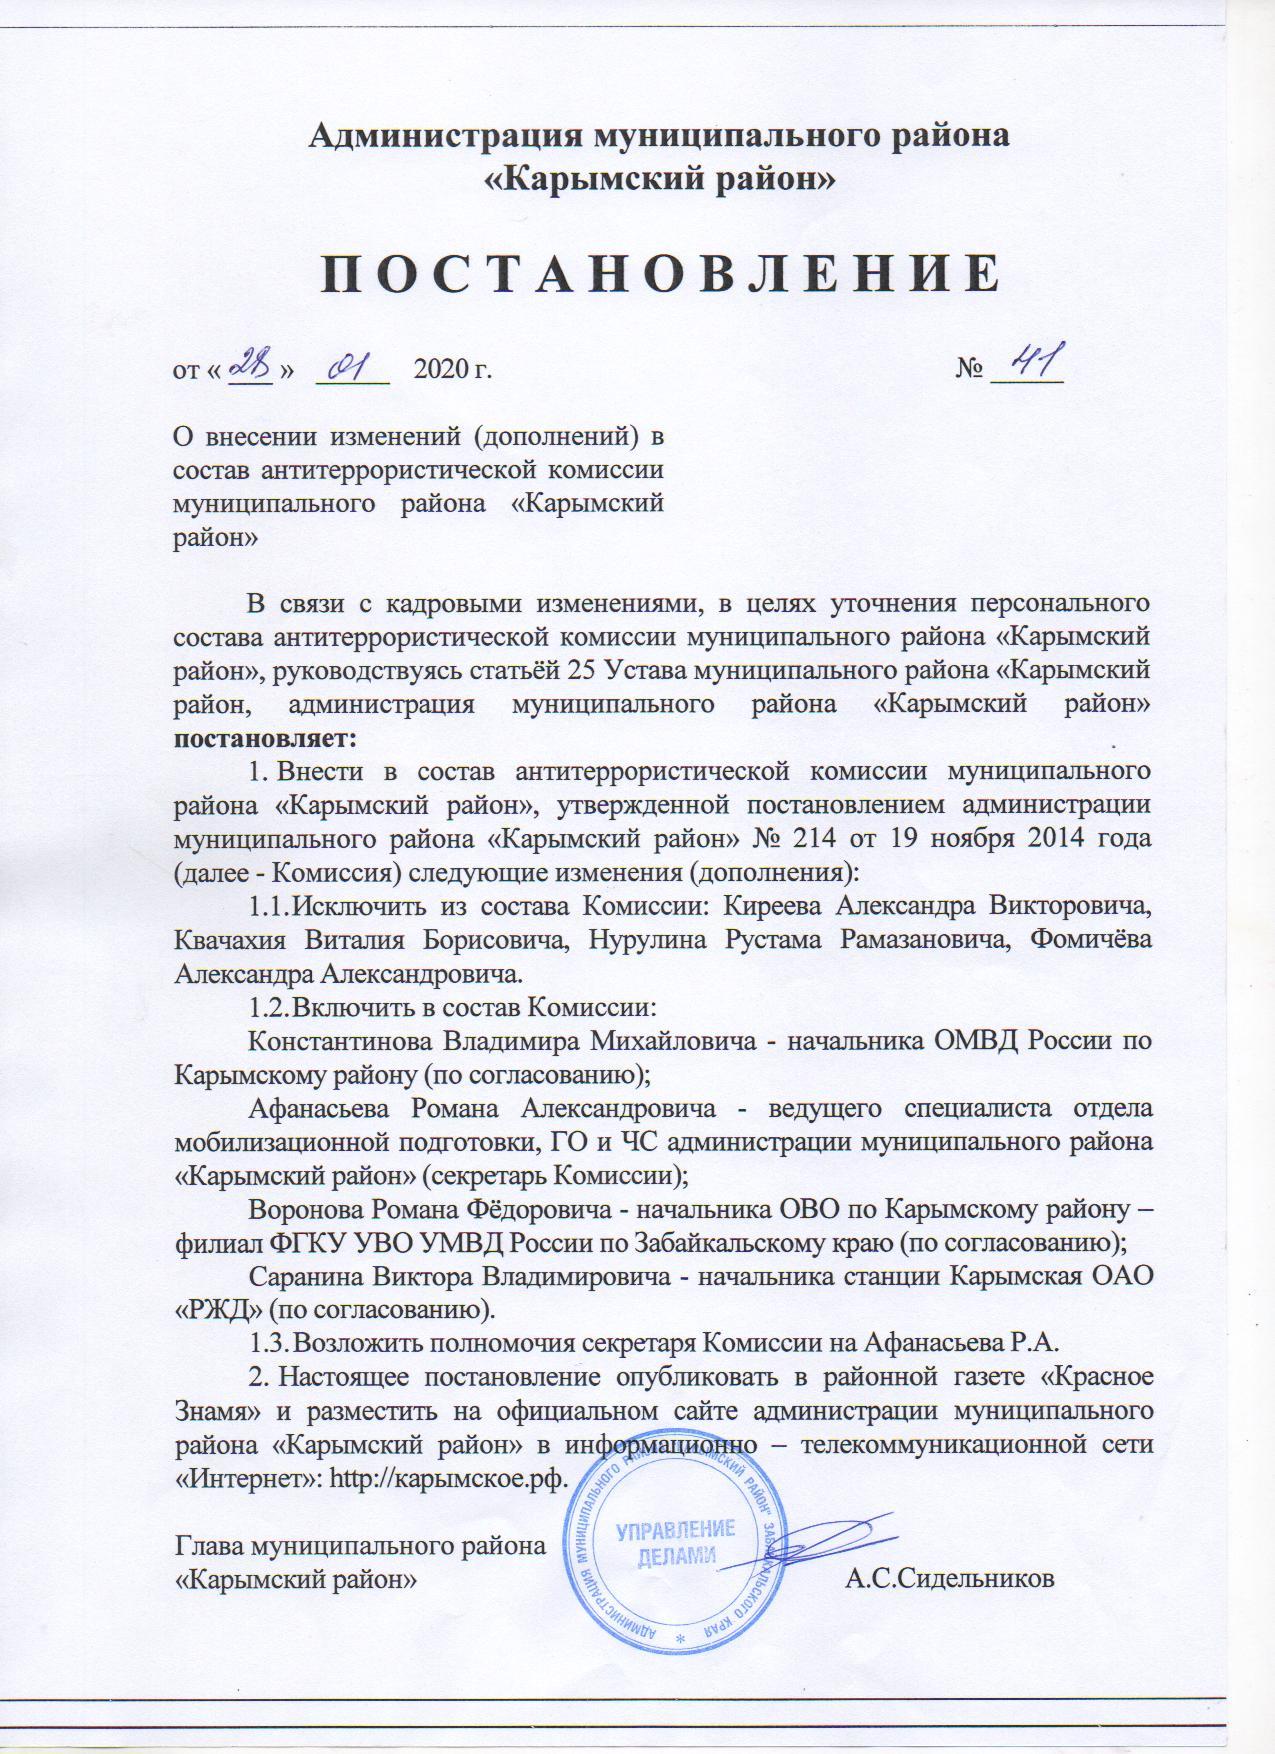 Постановление 41 изм. антитер.